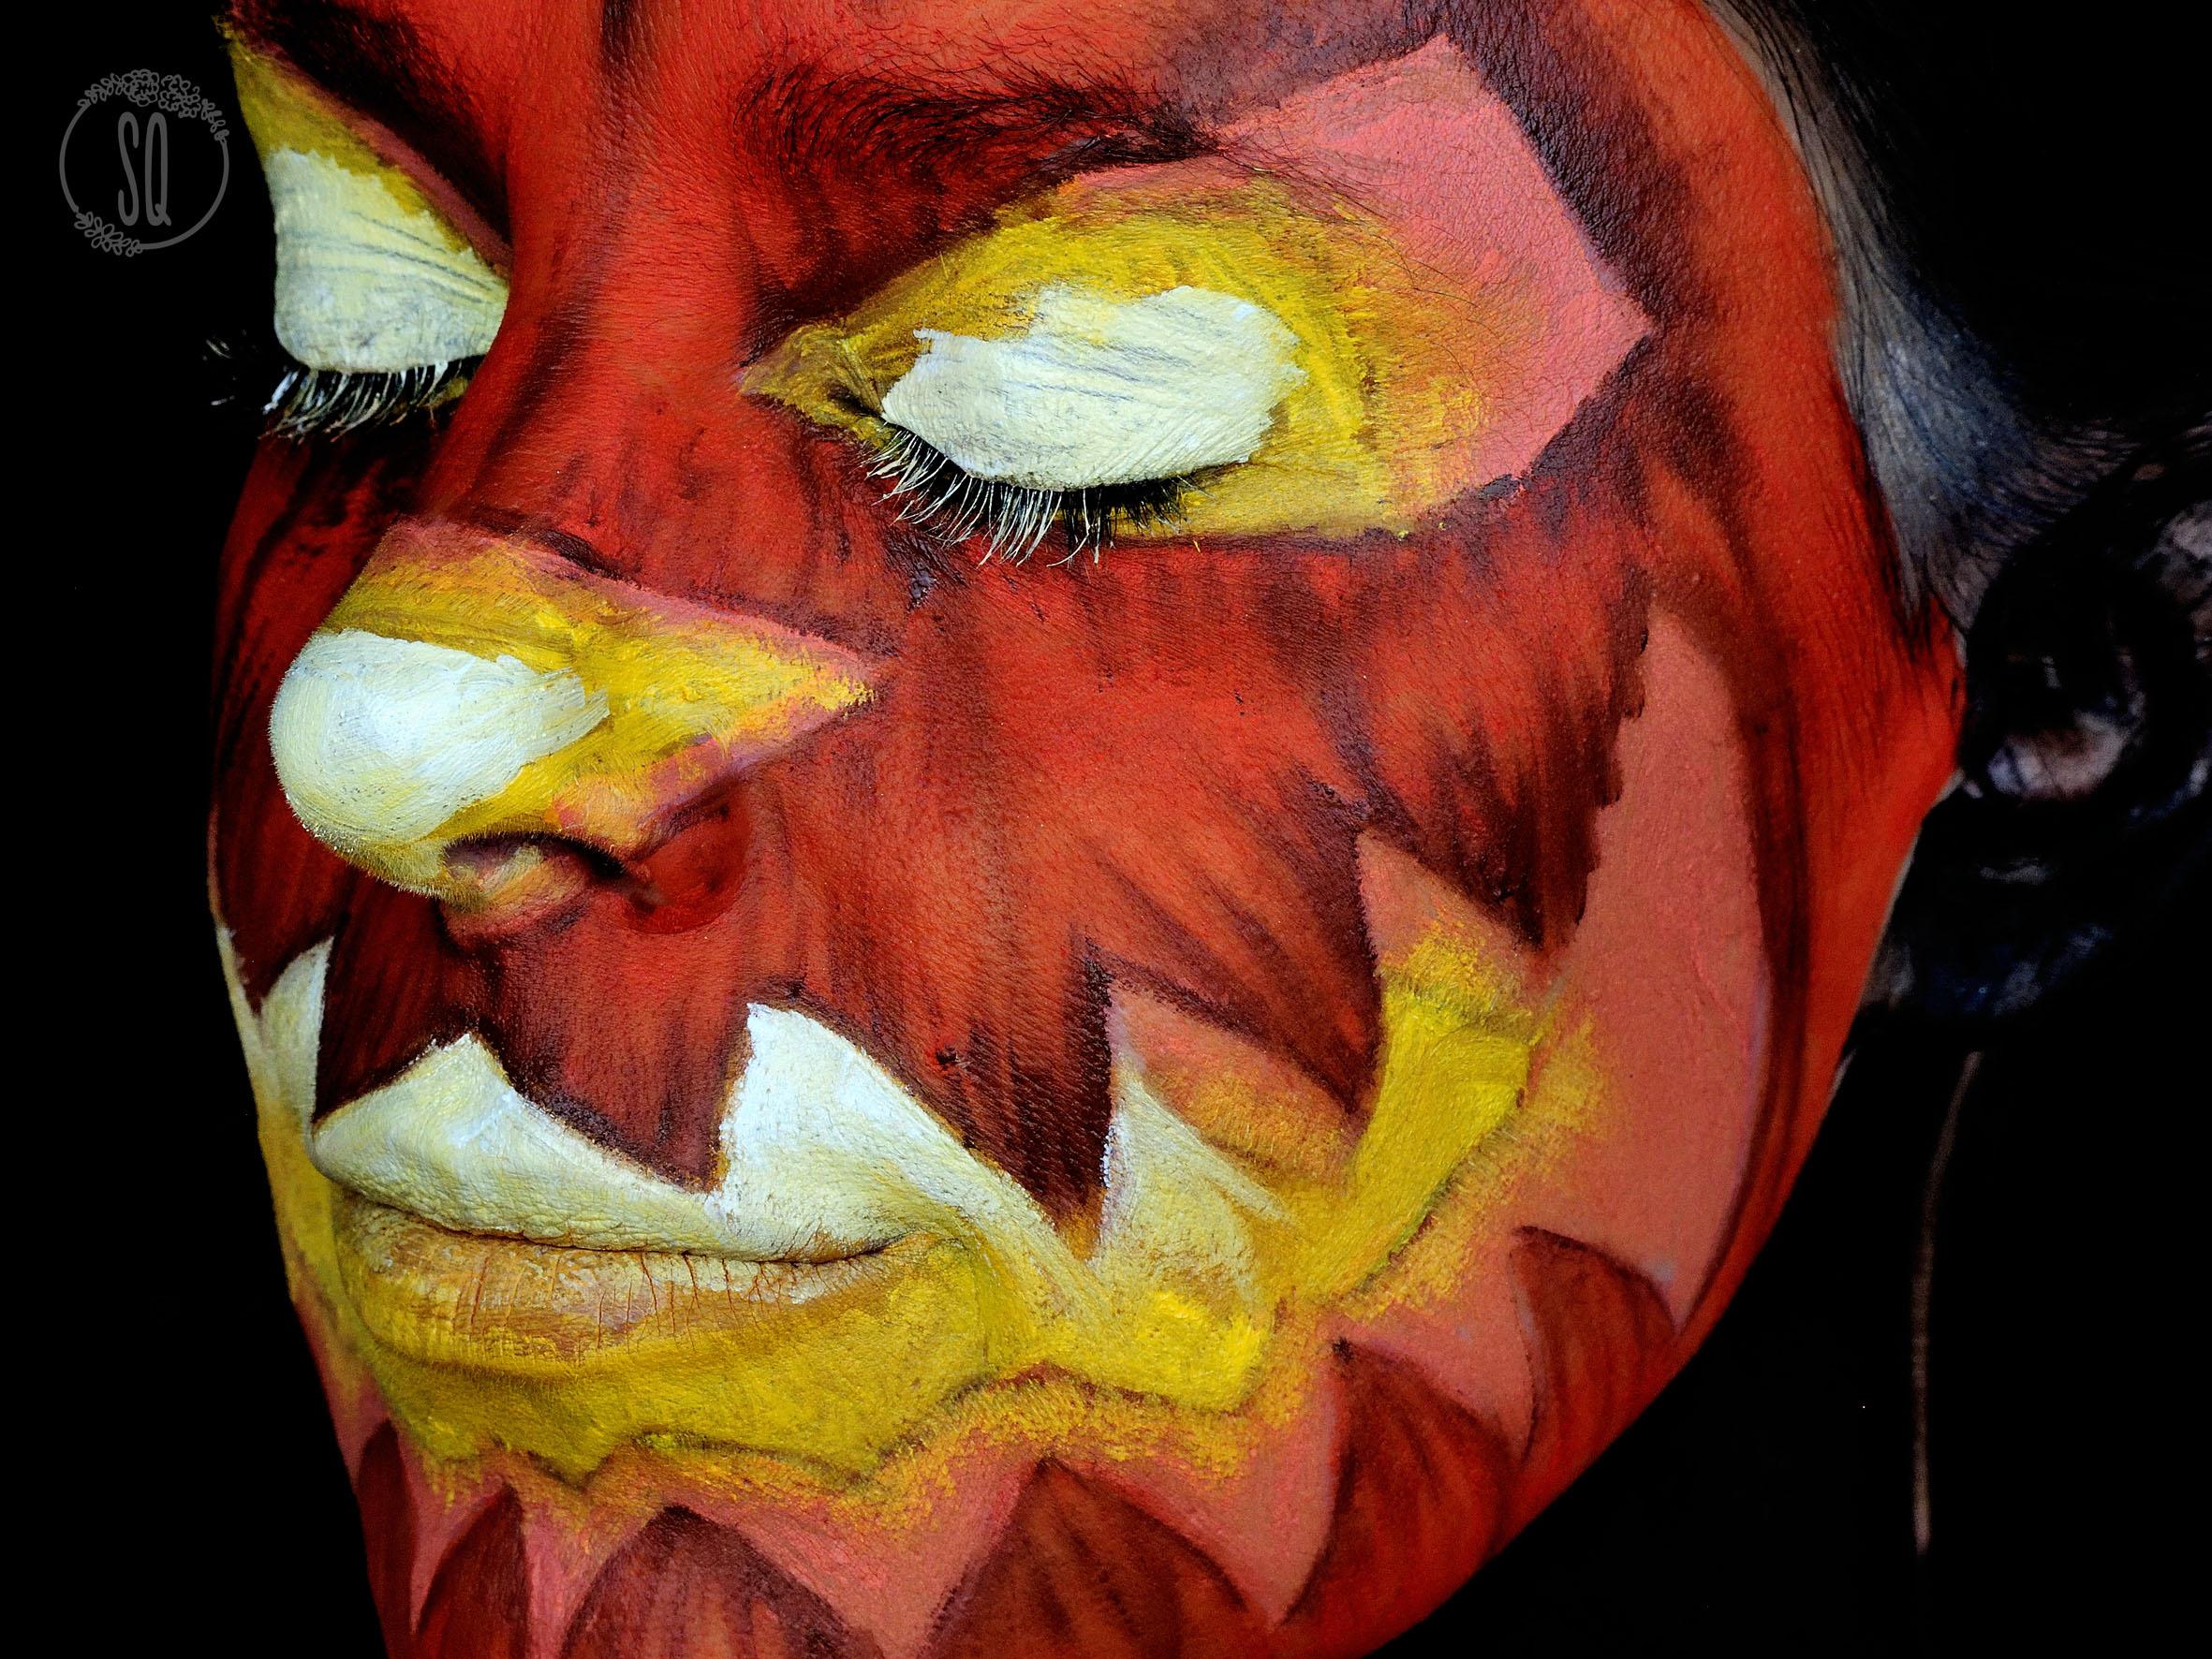 Carved pumpkin makeup tutorial for halloween silvia quirós